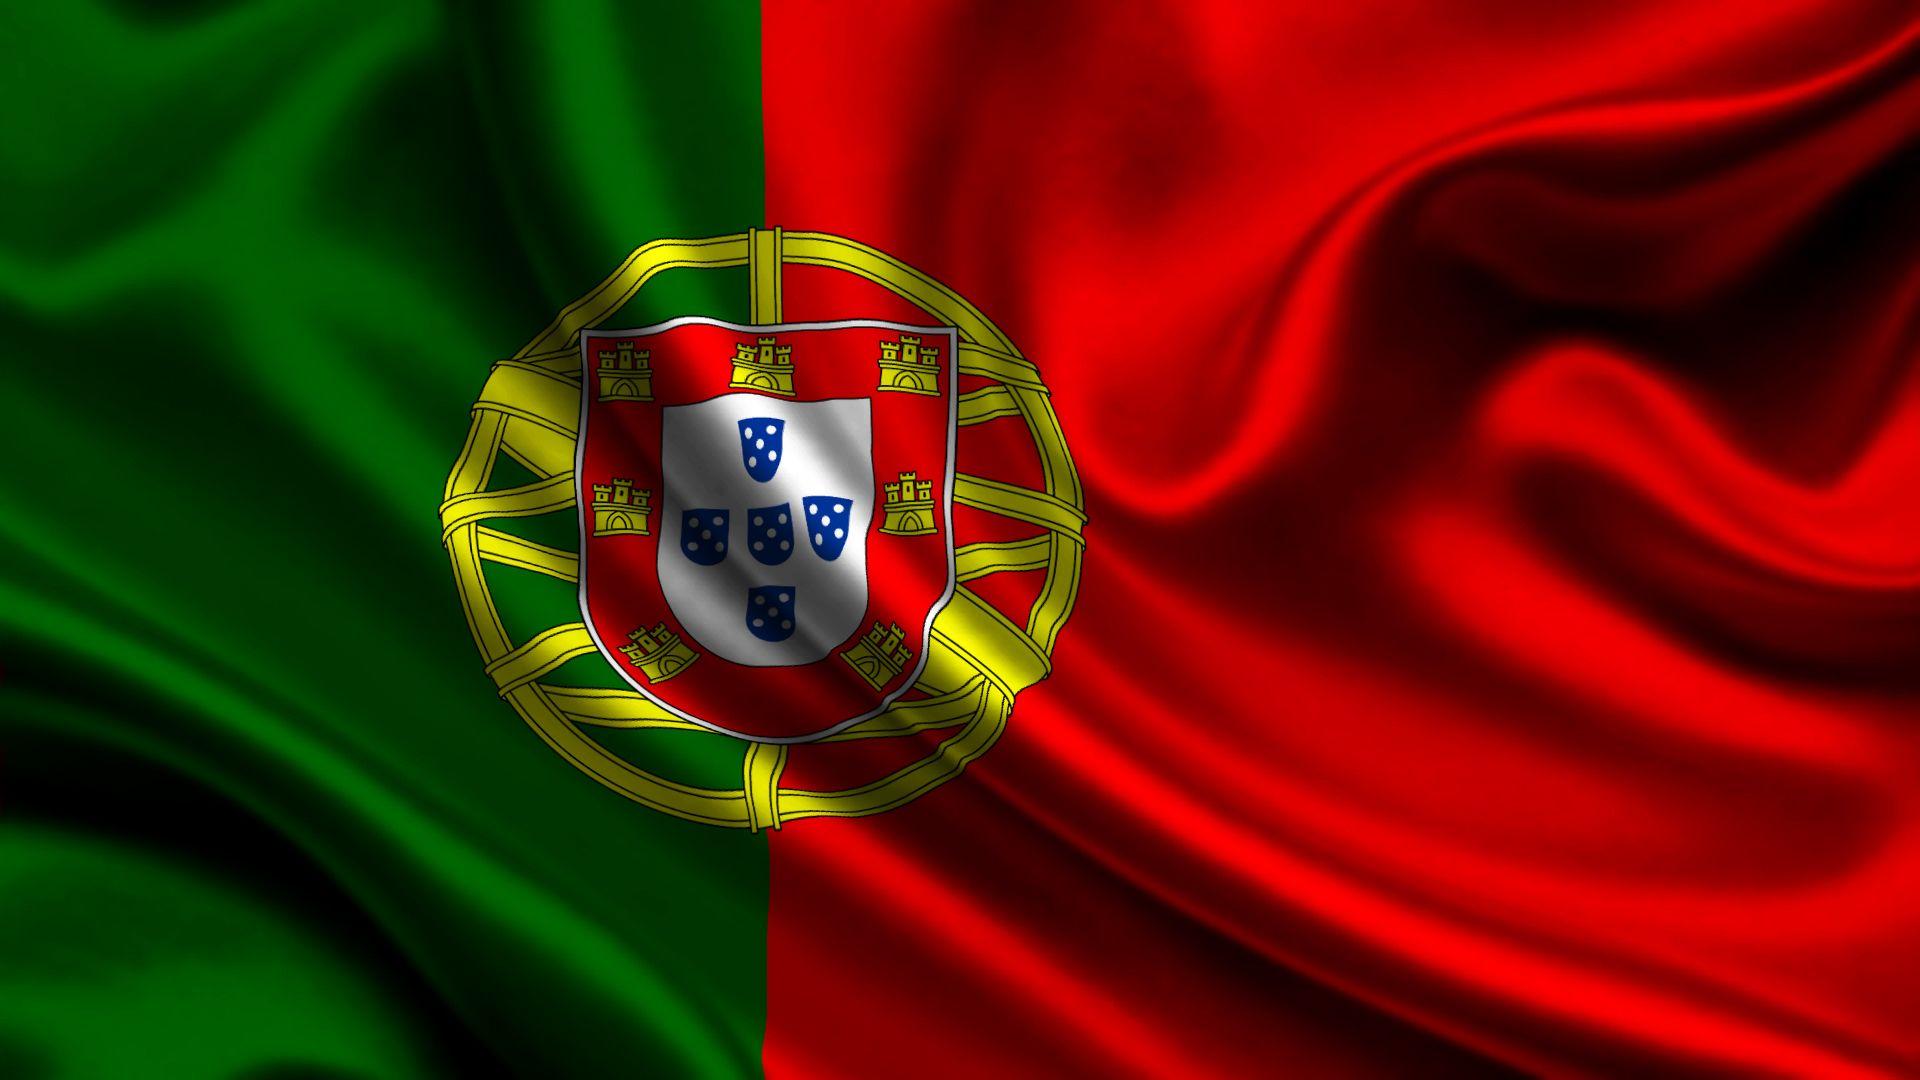 Bibliography Portuguese flag Portugal flag Portuguese flag 1920x1080